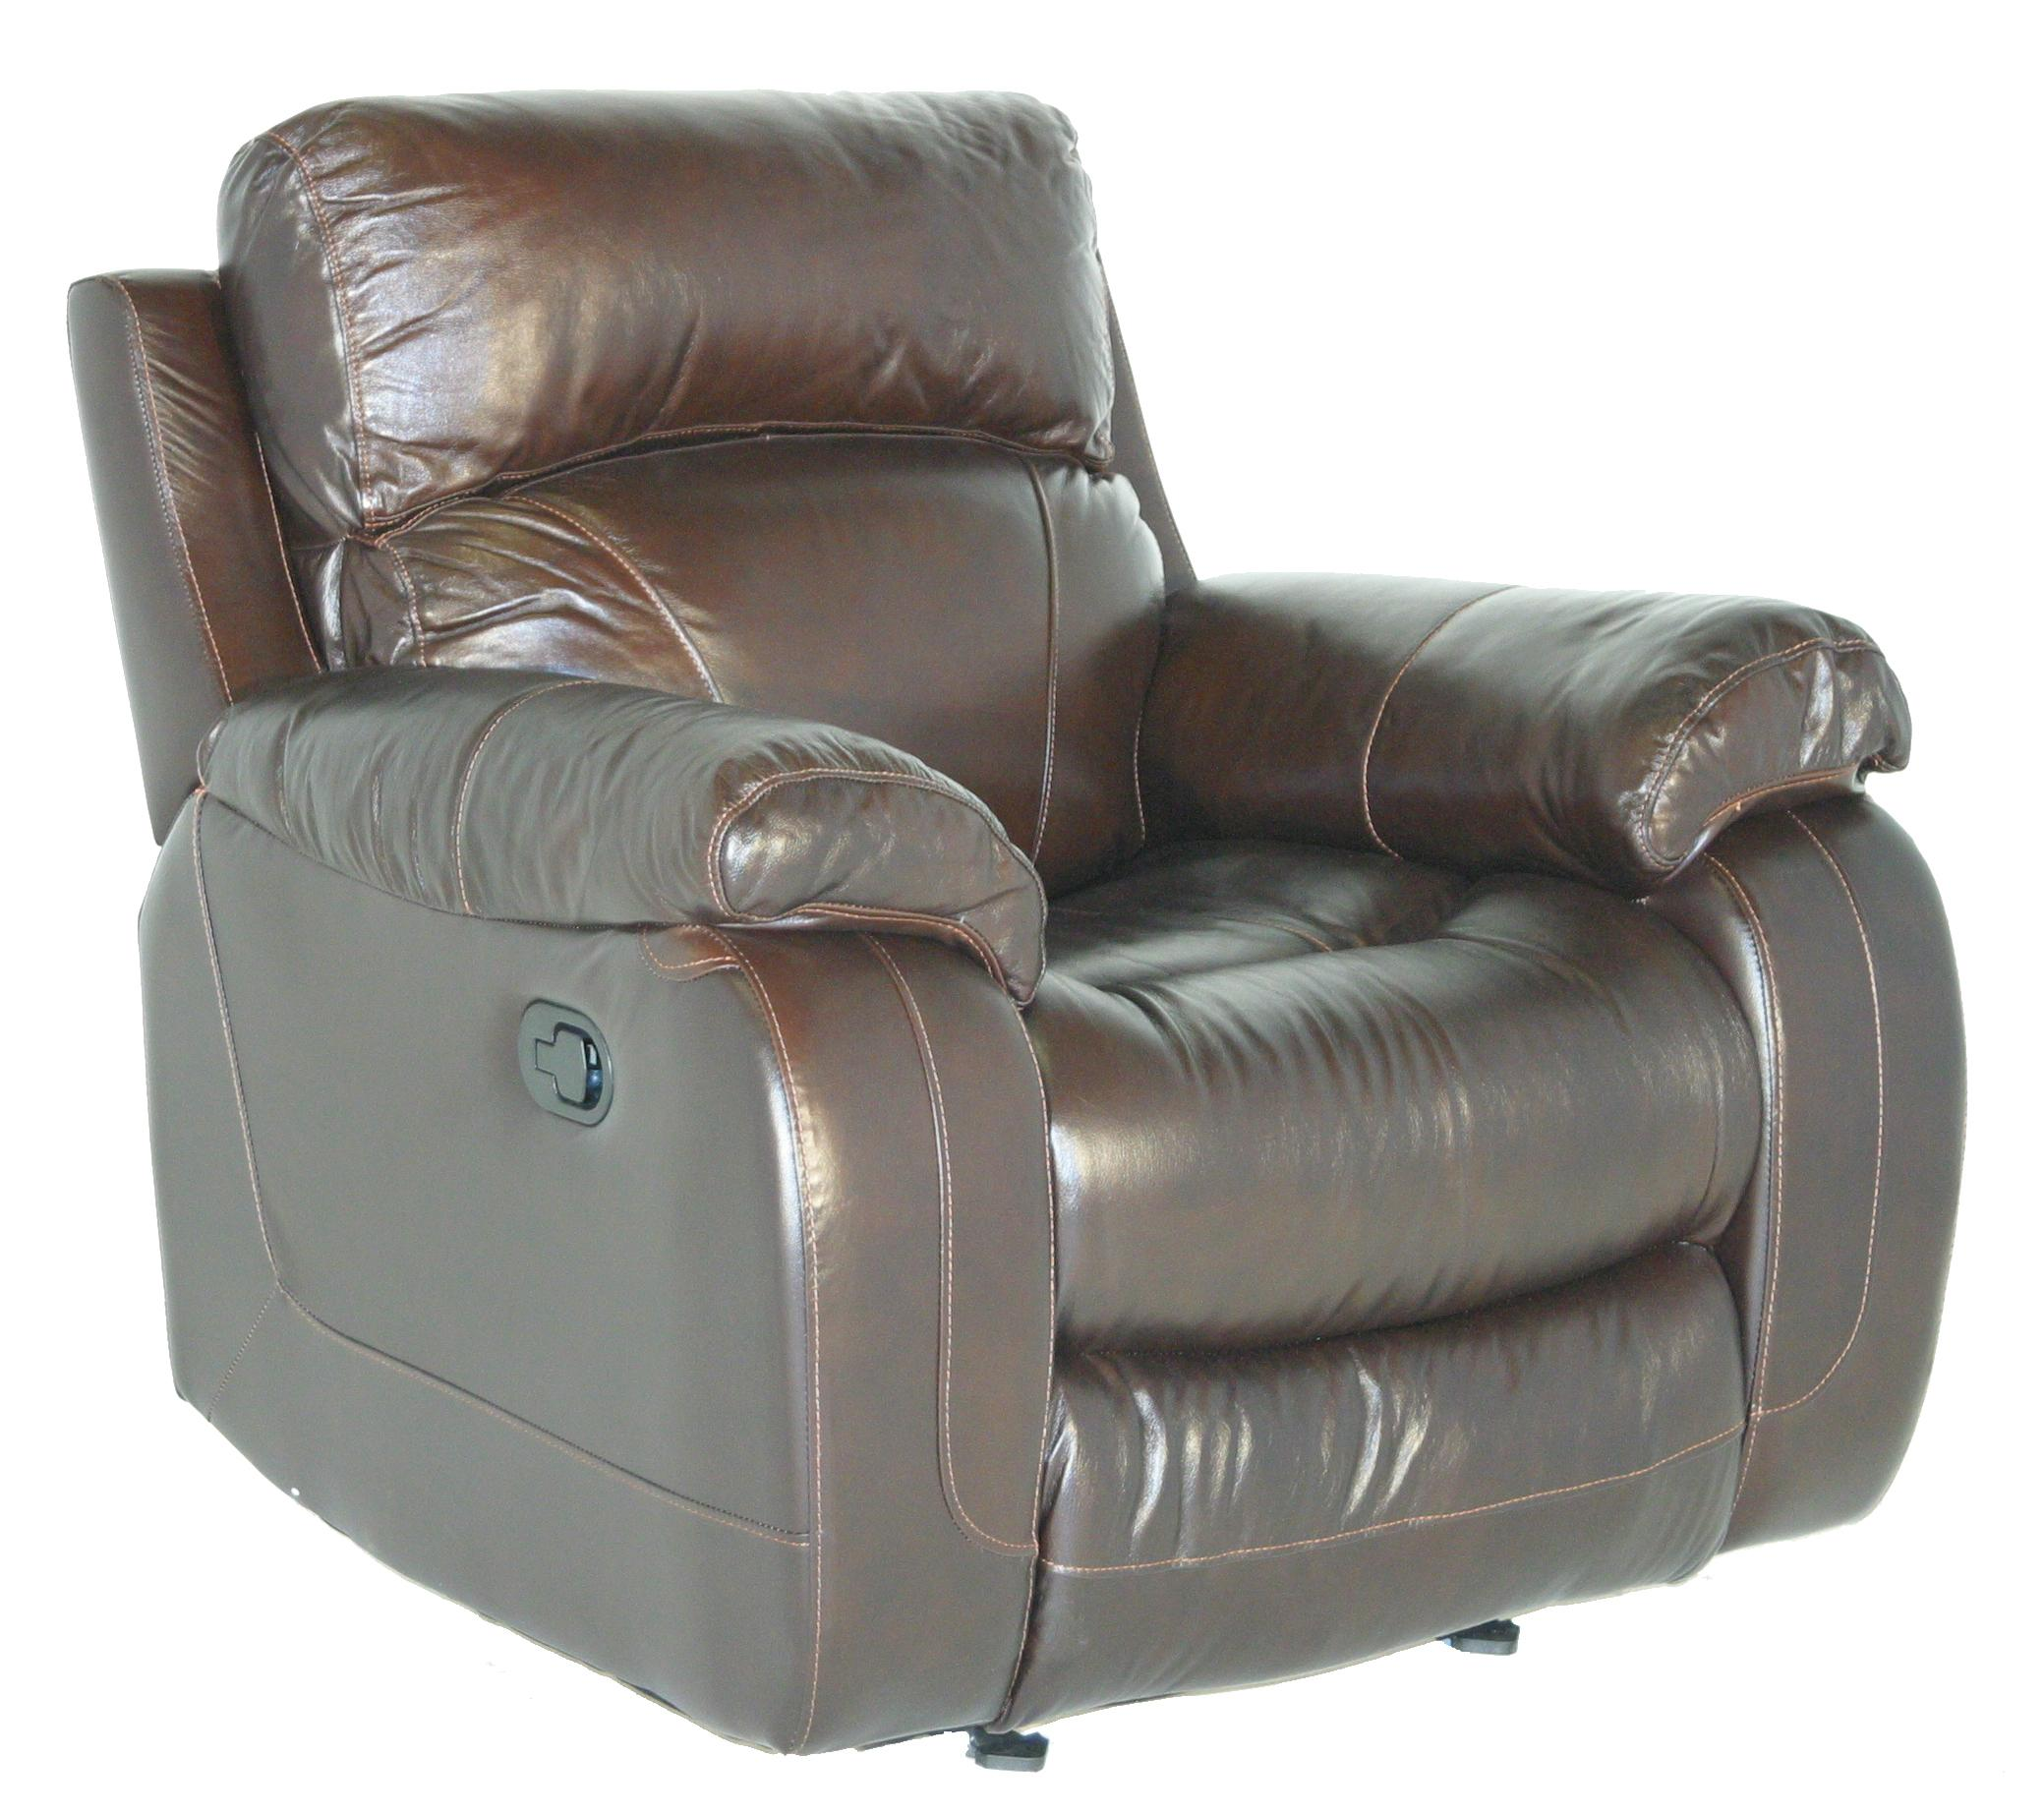 man wah furniture parts  Home Decor